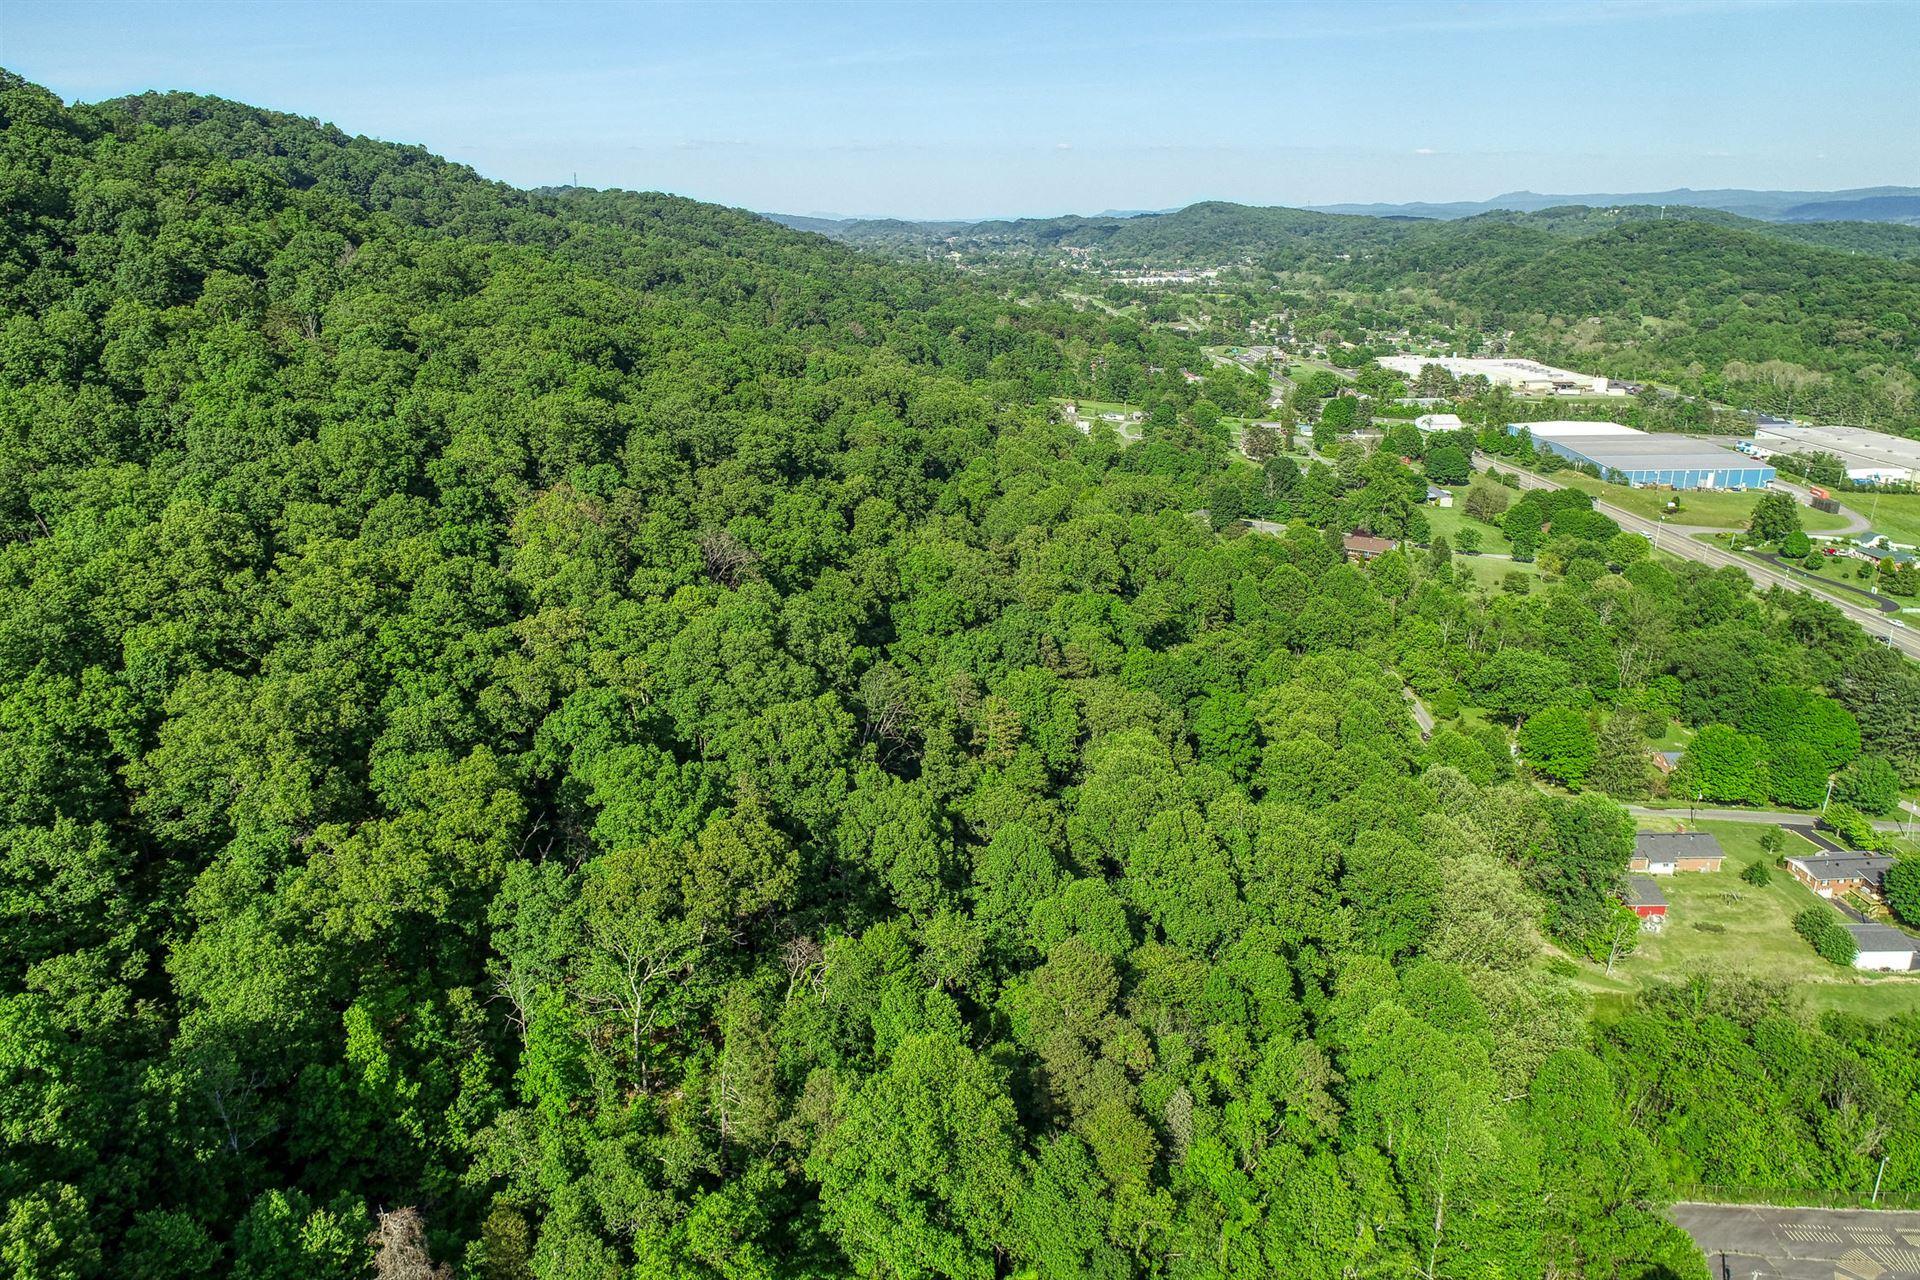 Photo of Tbd1 Ross Circle, Rogersville, TN 37857 (MLS # 9923379)